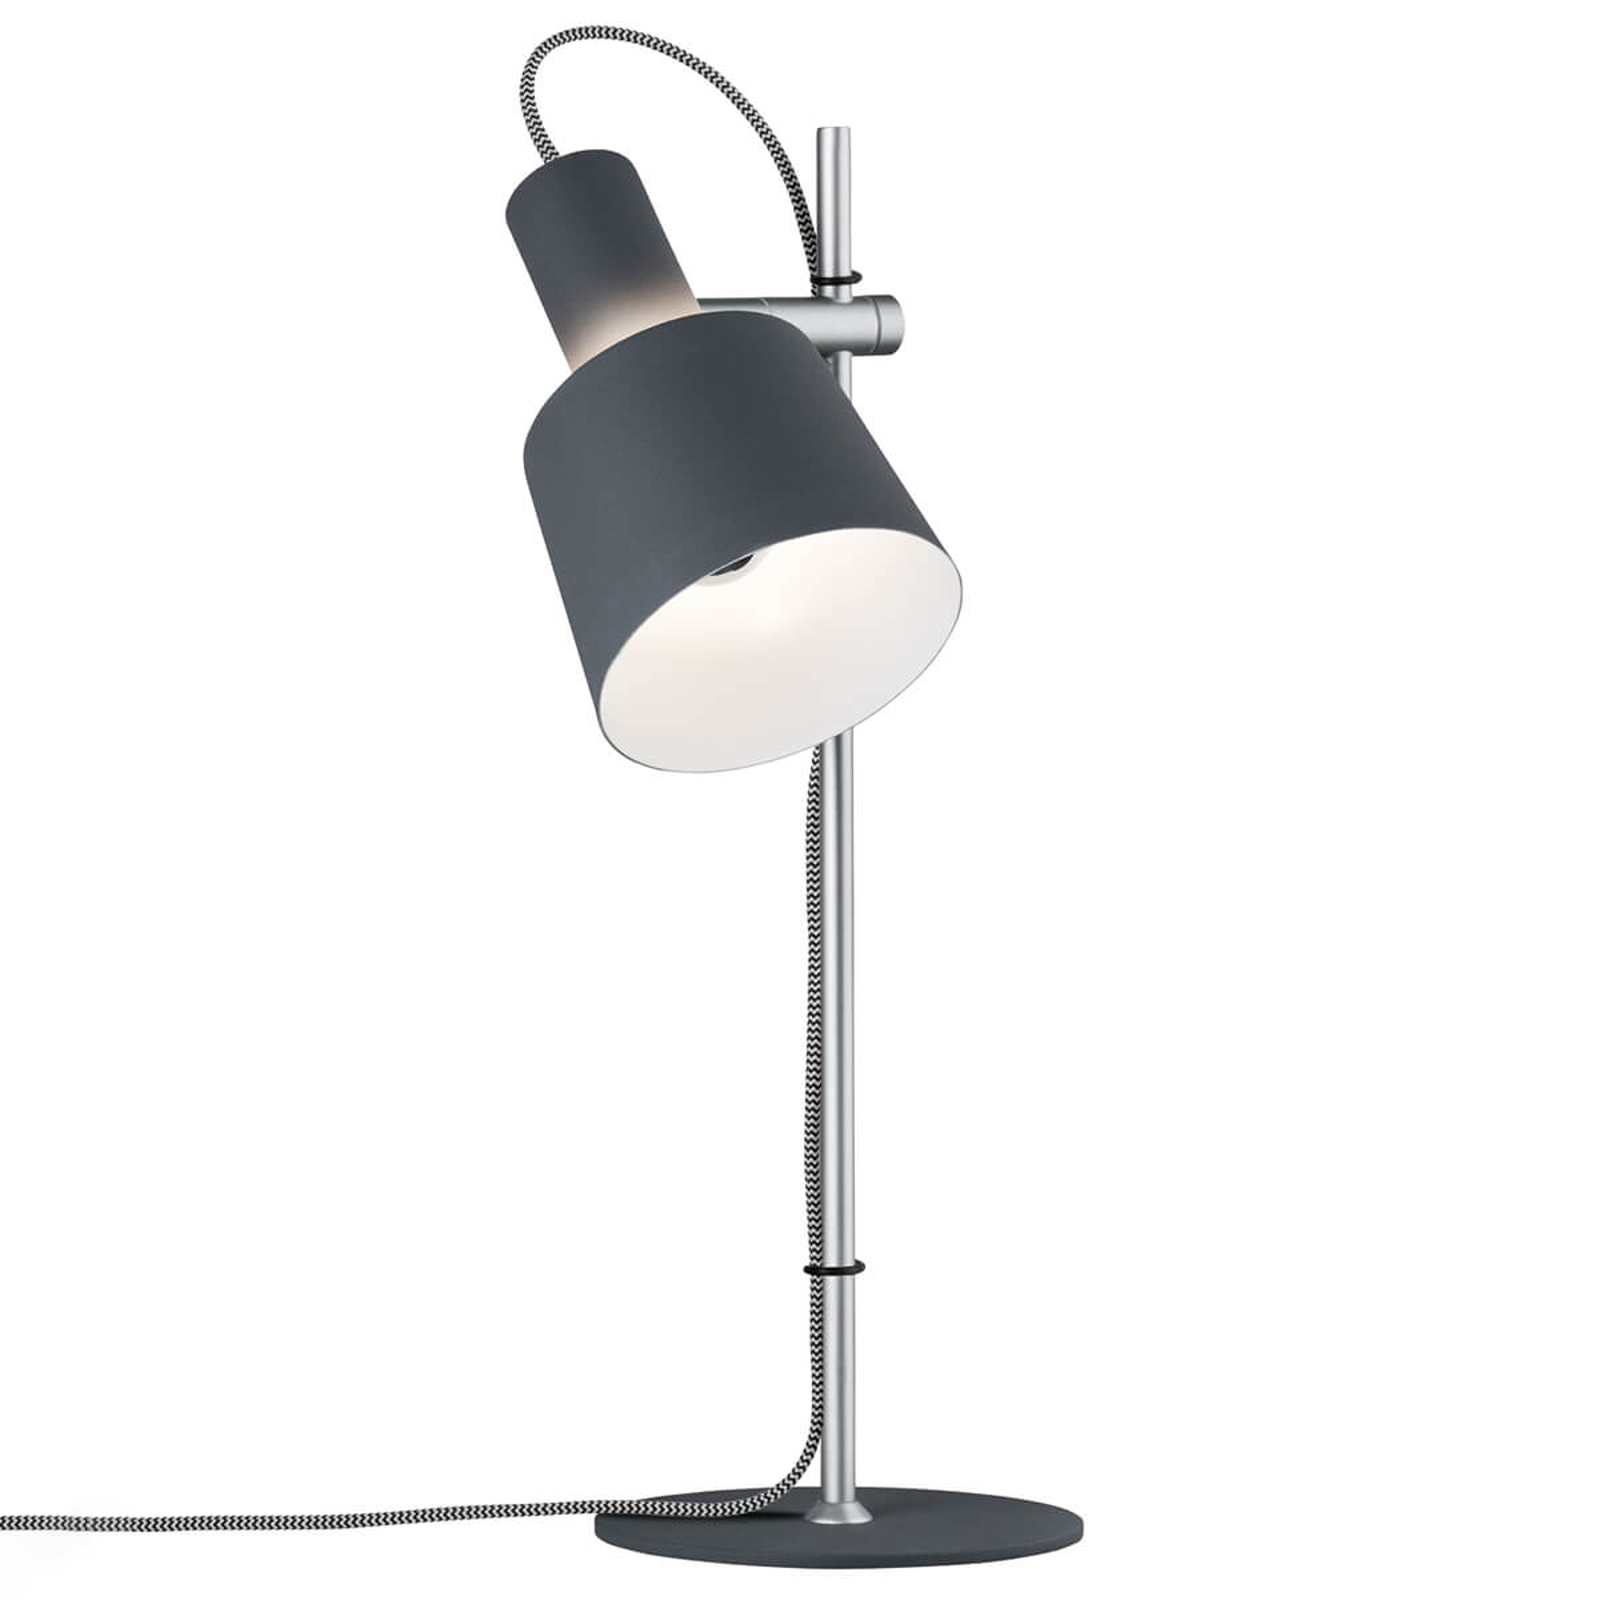 Lampe à poser moderne Haldar en gris foncé